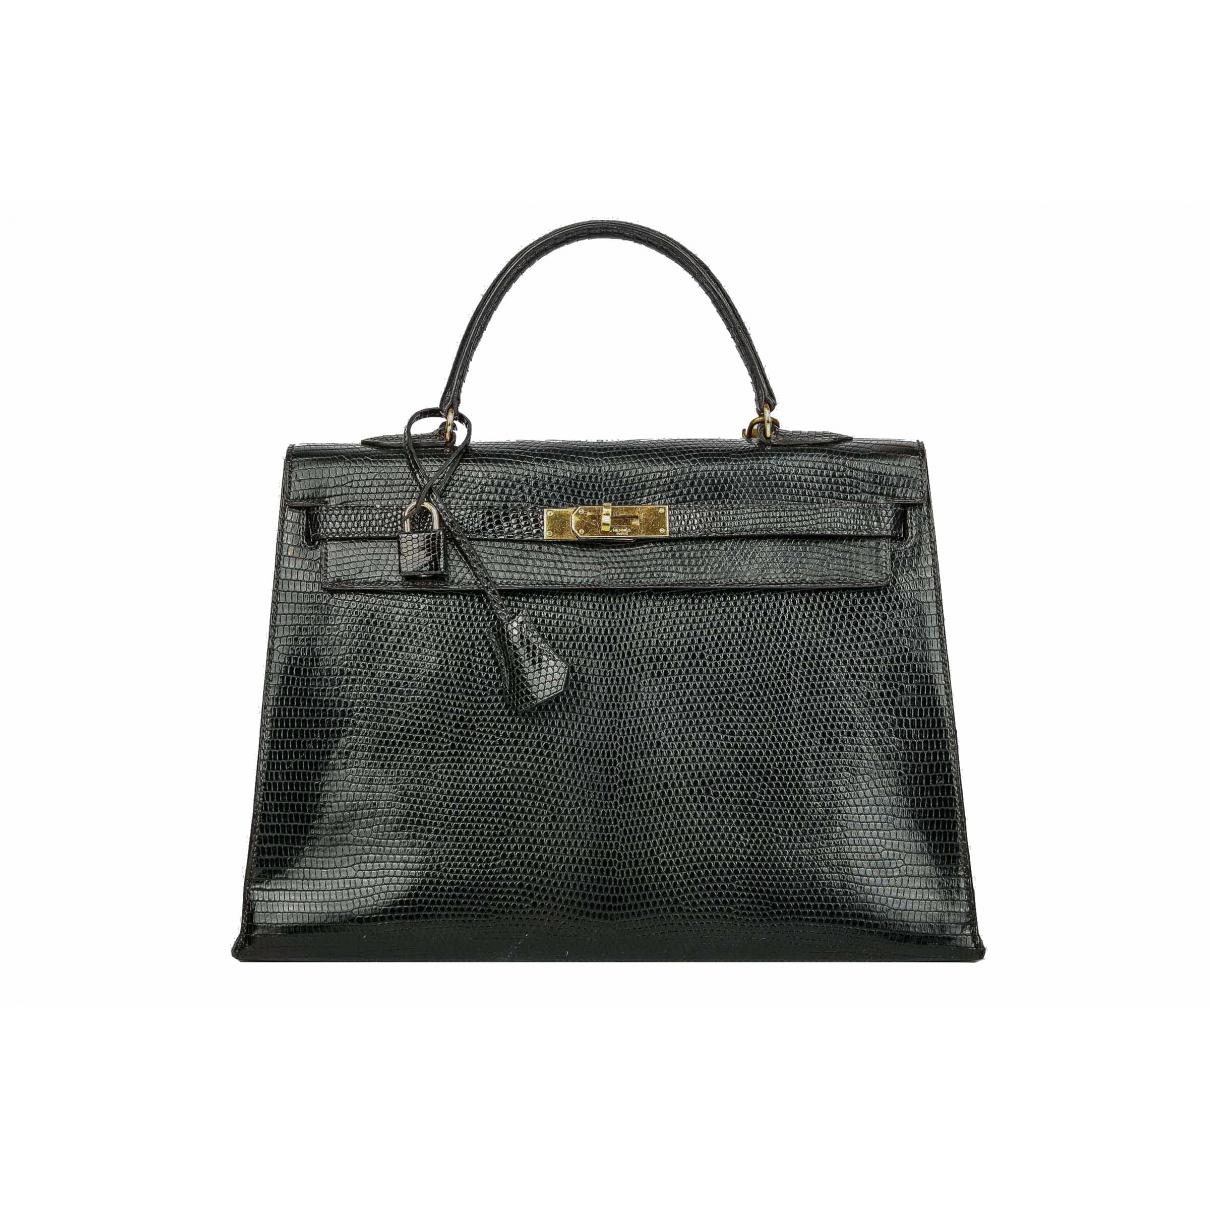 Hermes Kelly 35 Handtasche in  Schwarz Echse